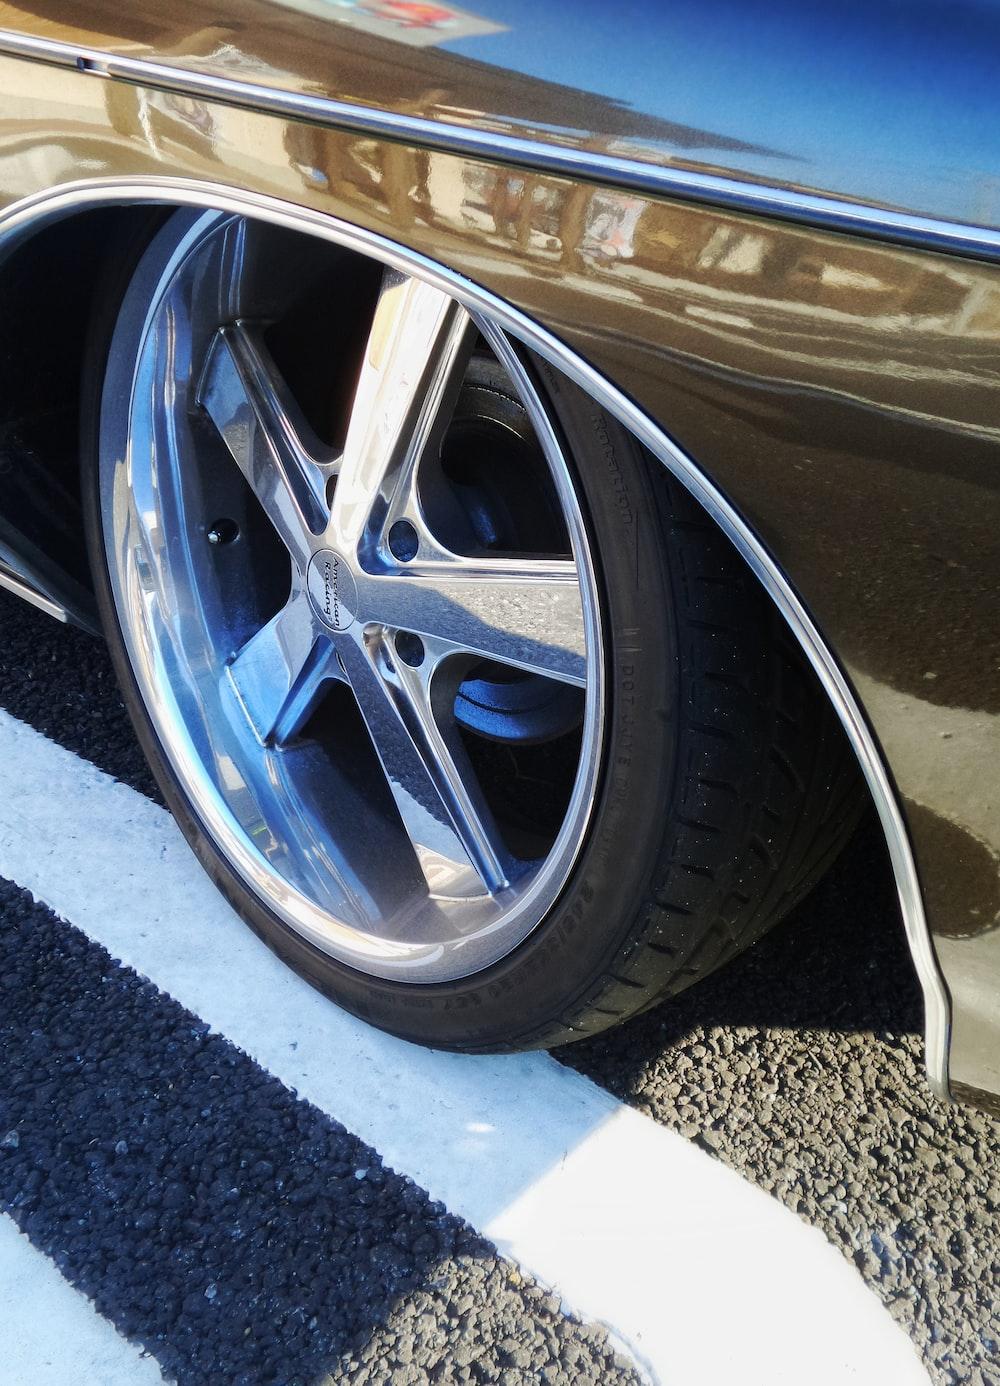 chrome vehicle wheel with black tire